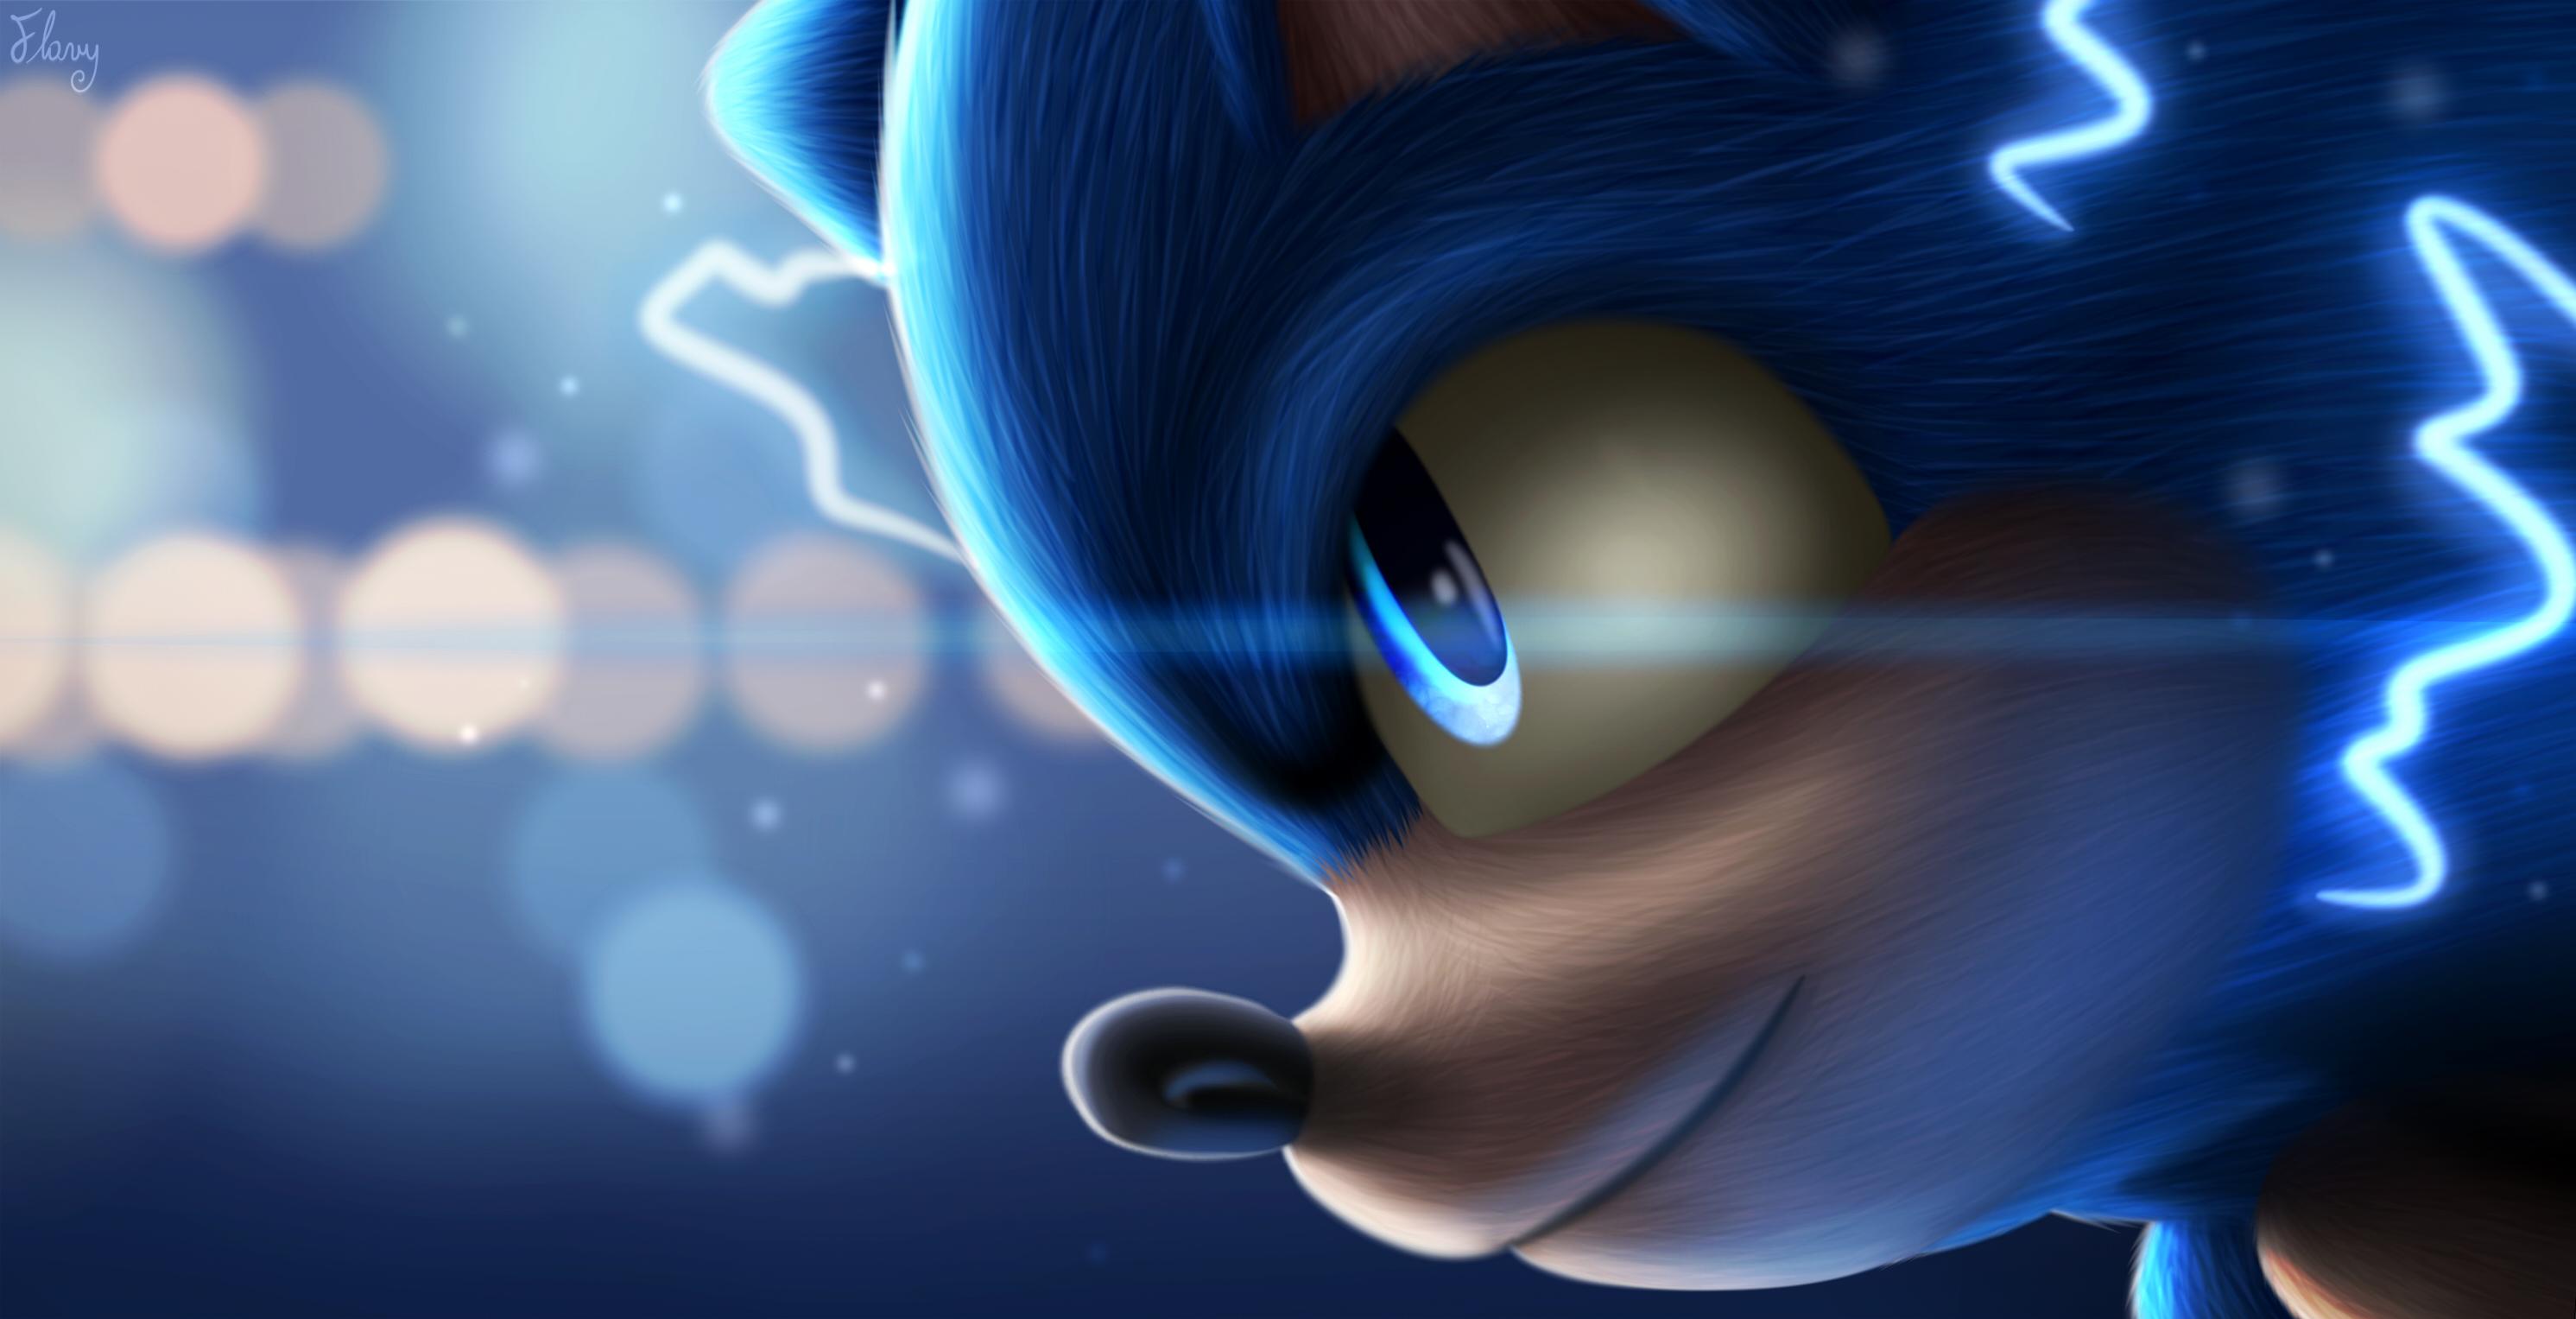 Sonic the Hedgehog Art Wallpaper, HD Movies 4K Wallpapers ...